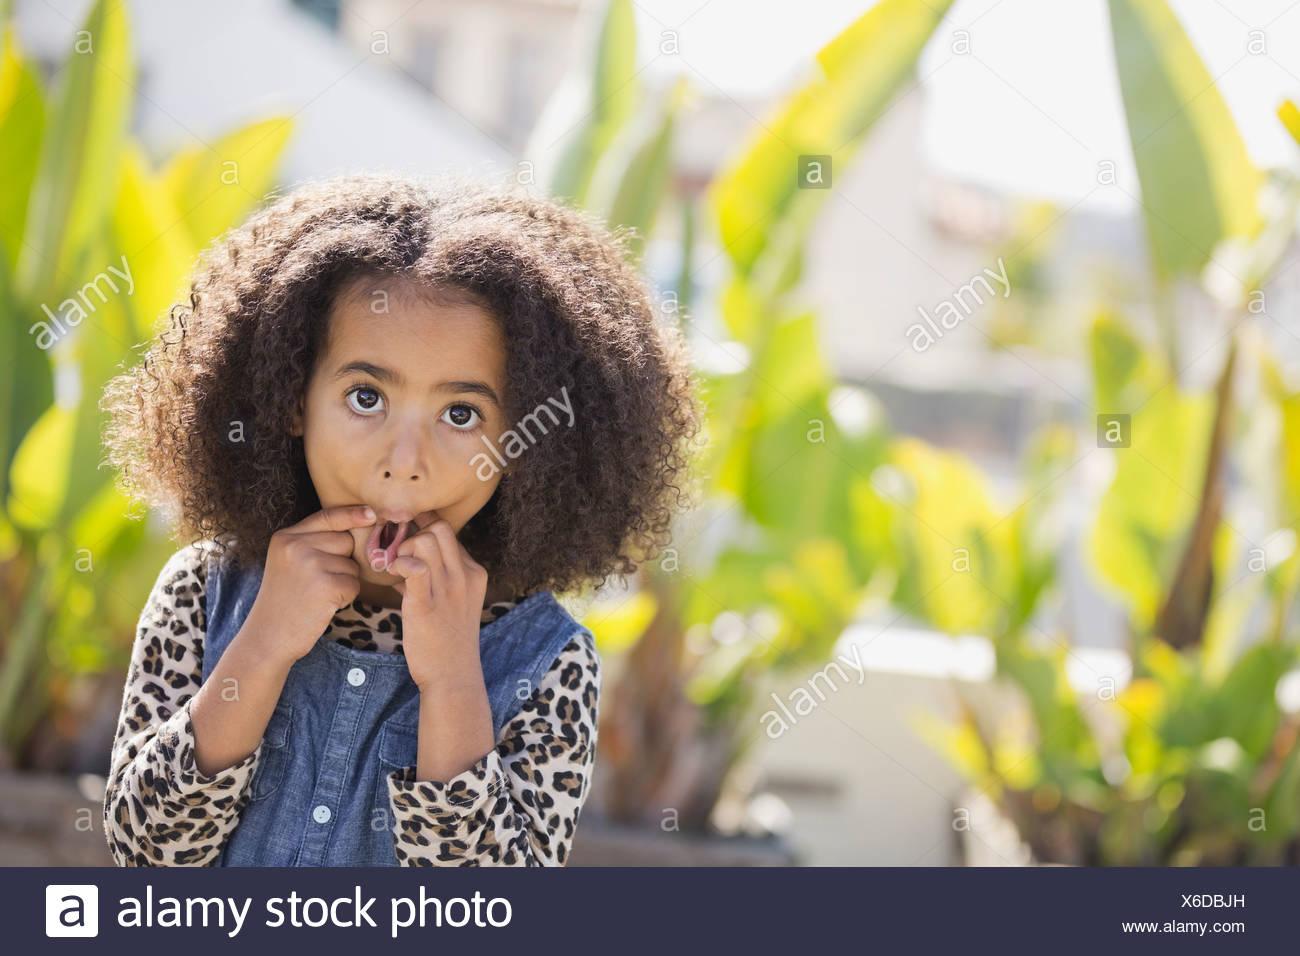 Retrato de linda chica haciendo caras exteriores Imagen De Stock